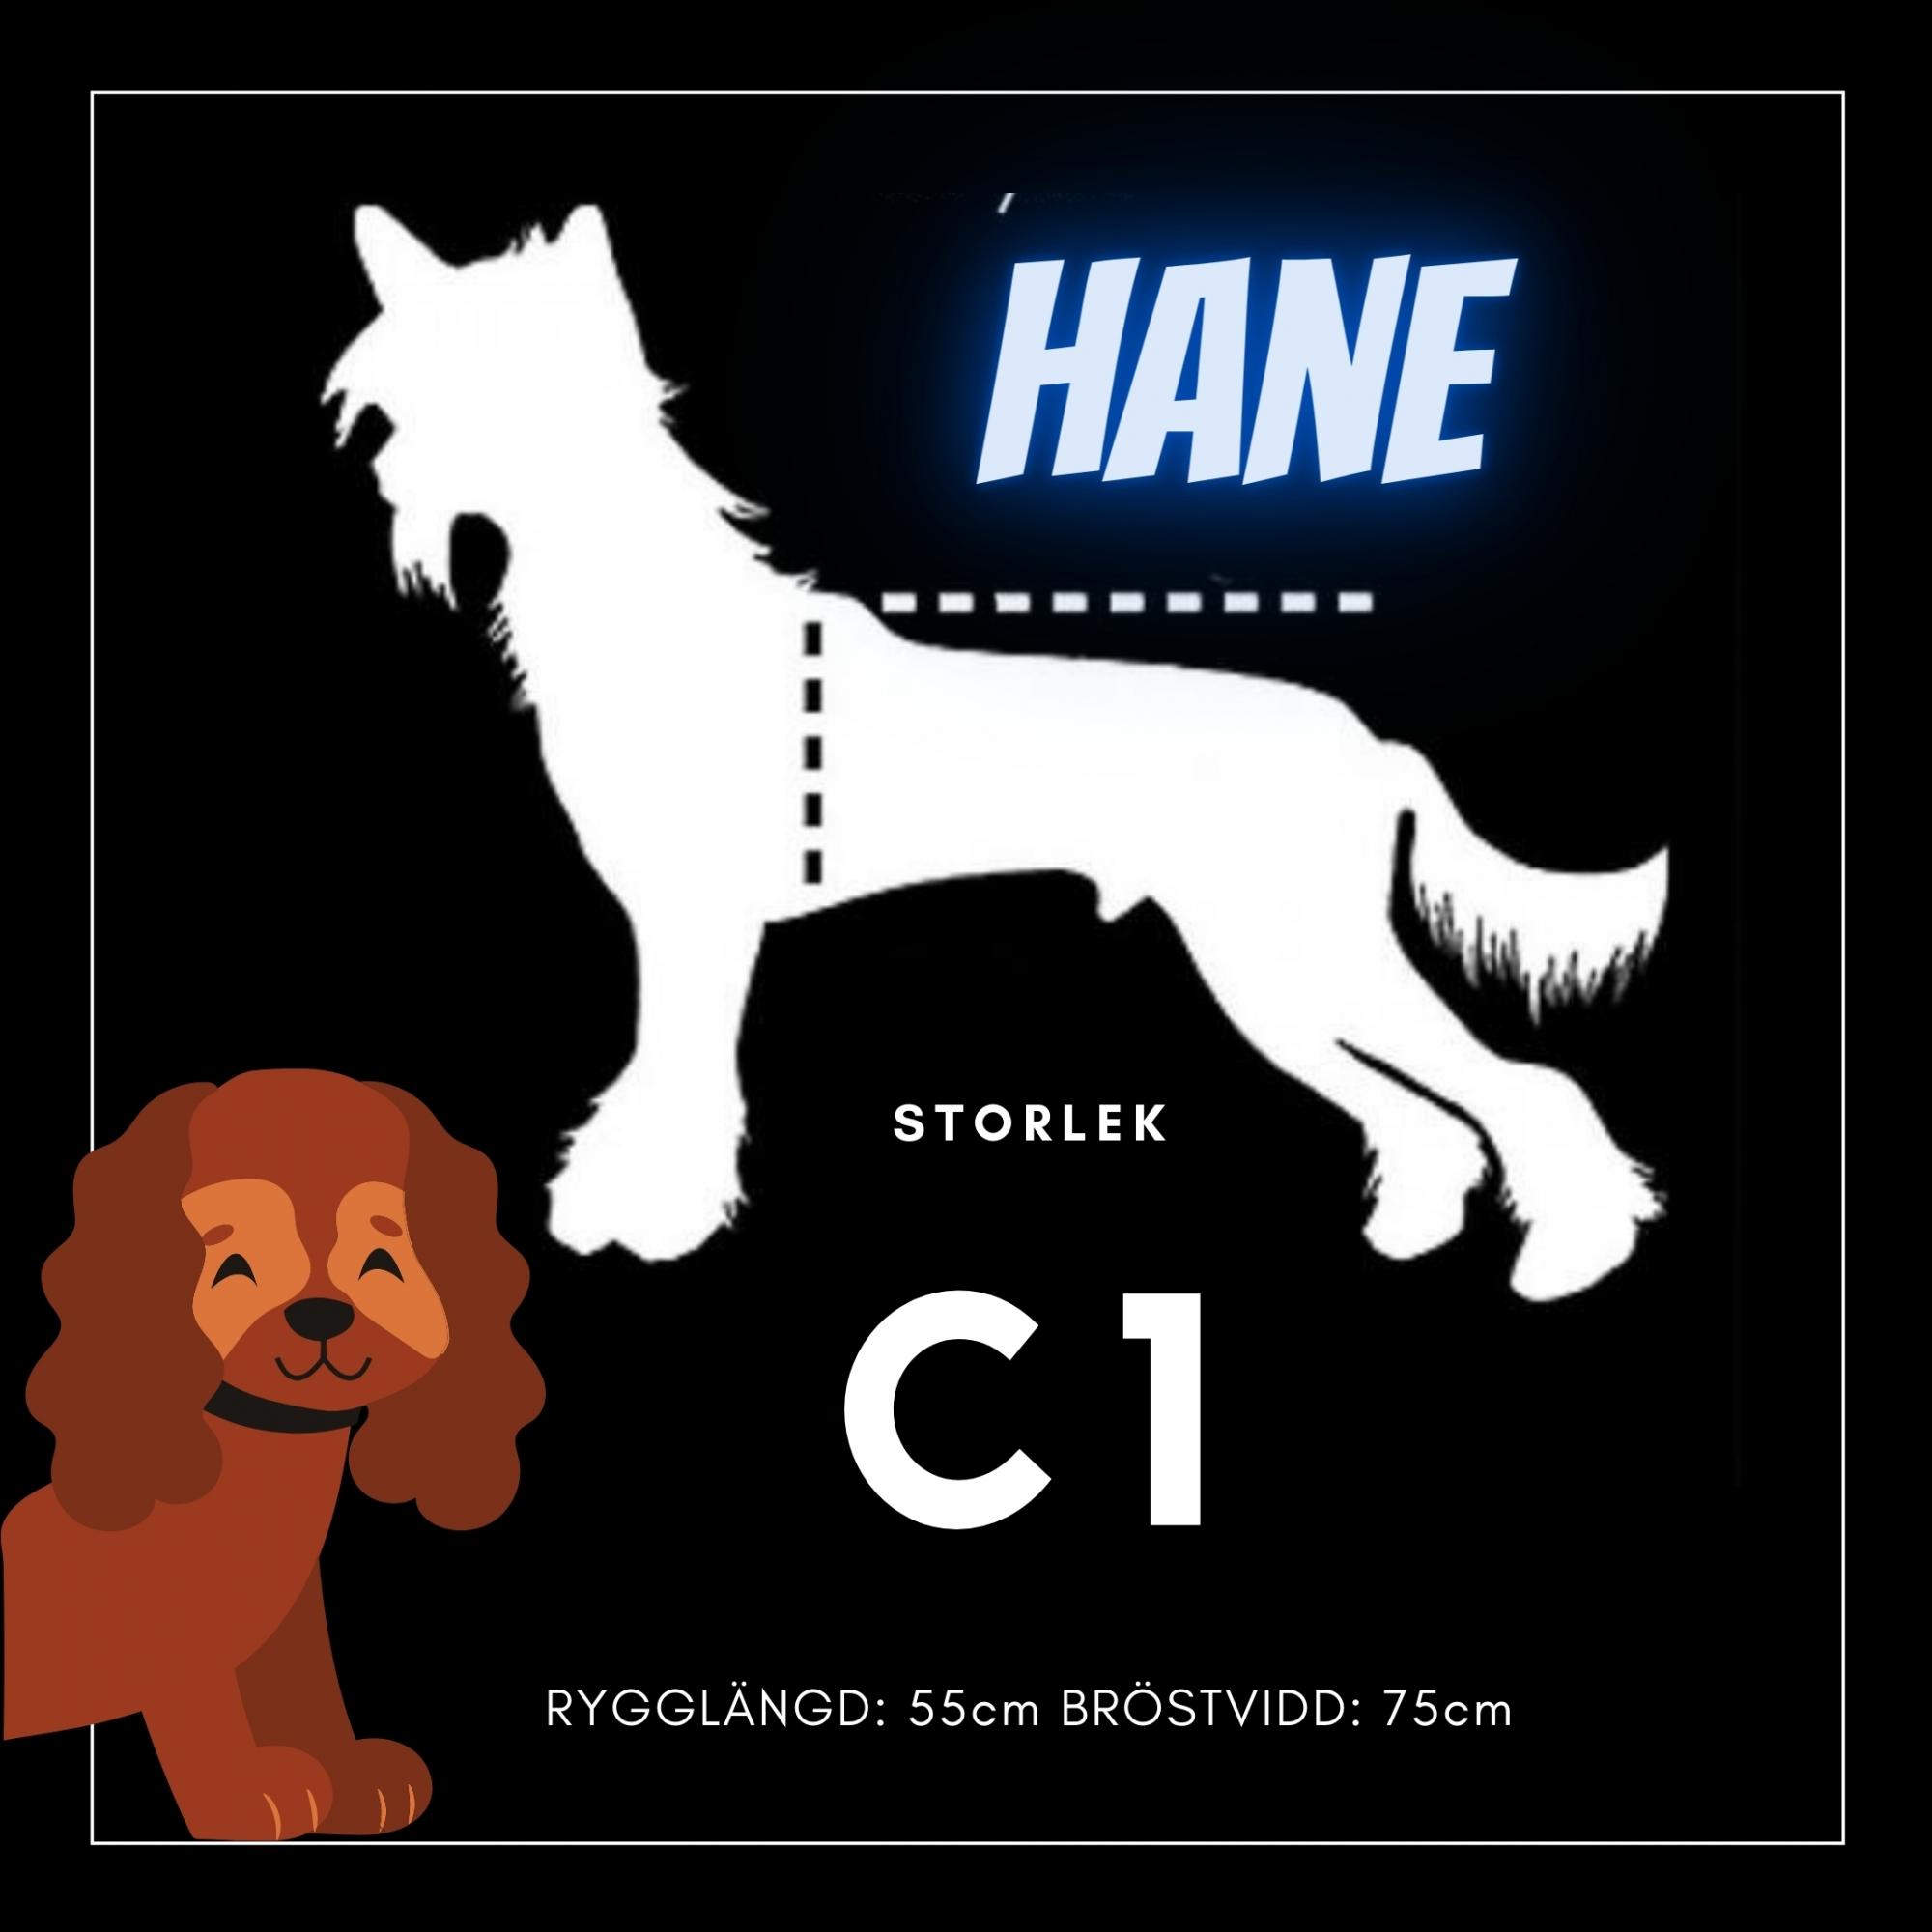 Hane Storlek C1 - Passion For Pet Fashion